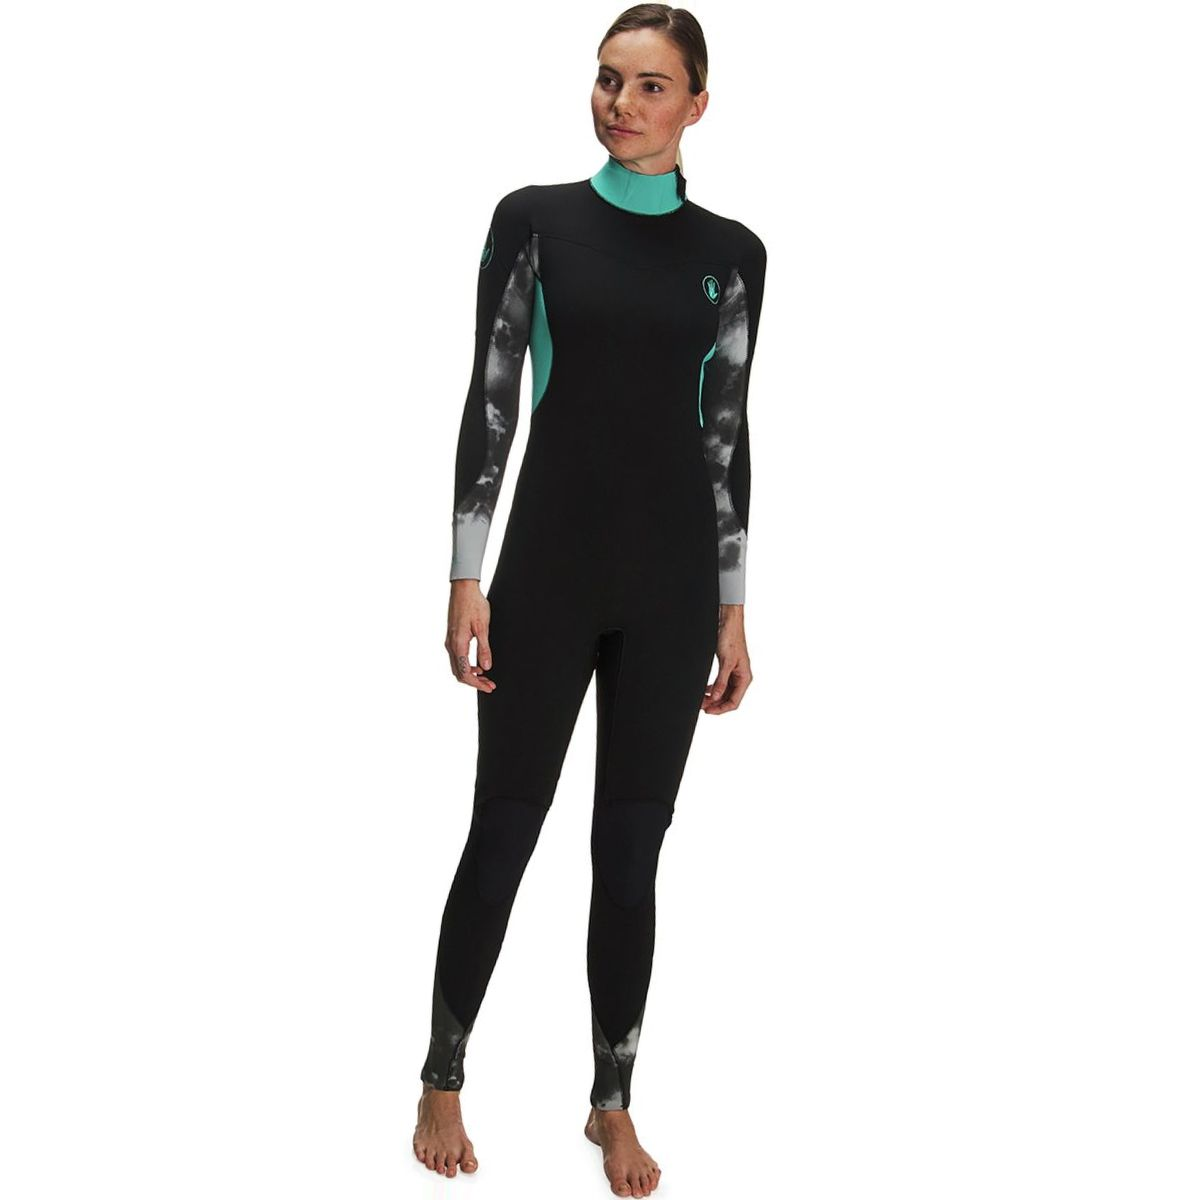 Body Glove Stellar Back Zip 3/2MM Full Wetsuit - Women's